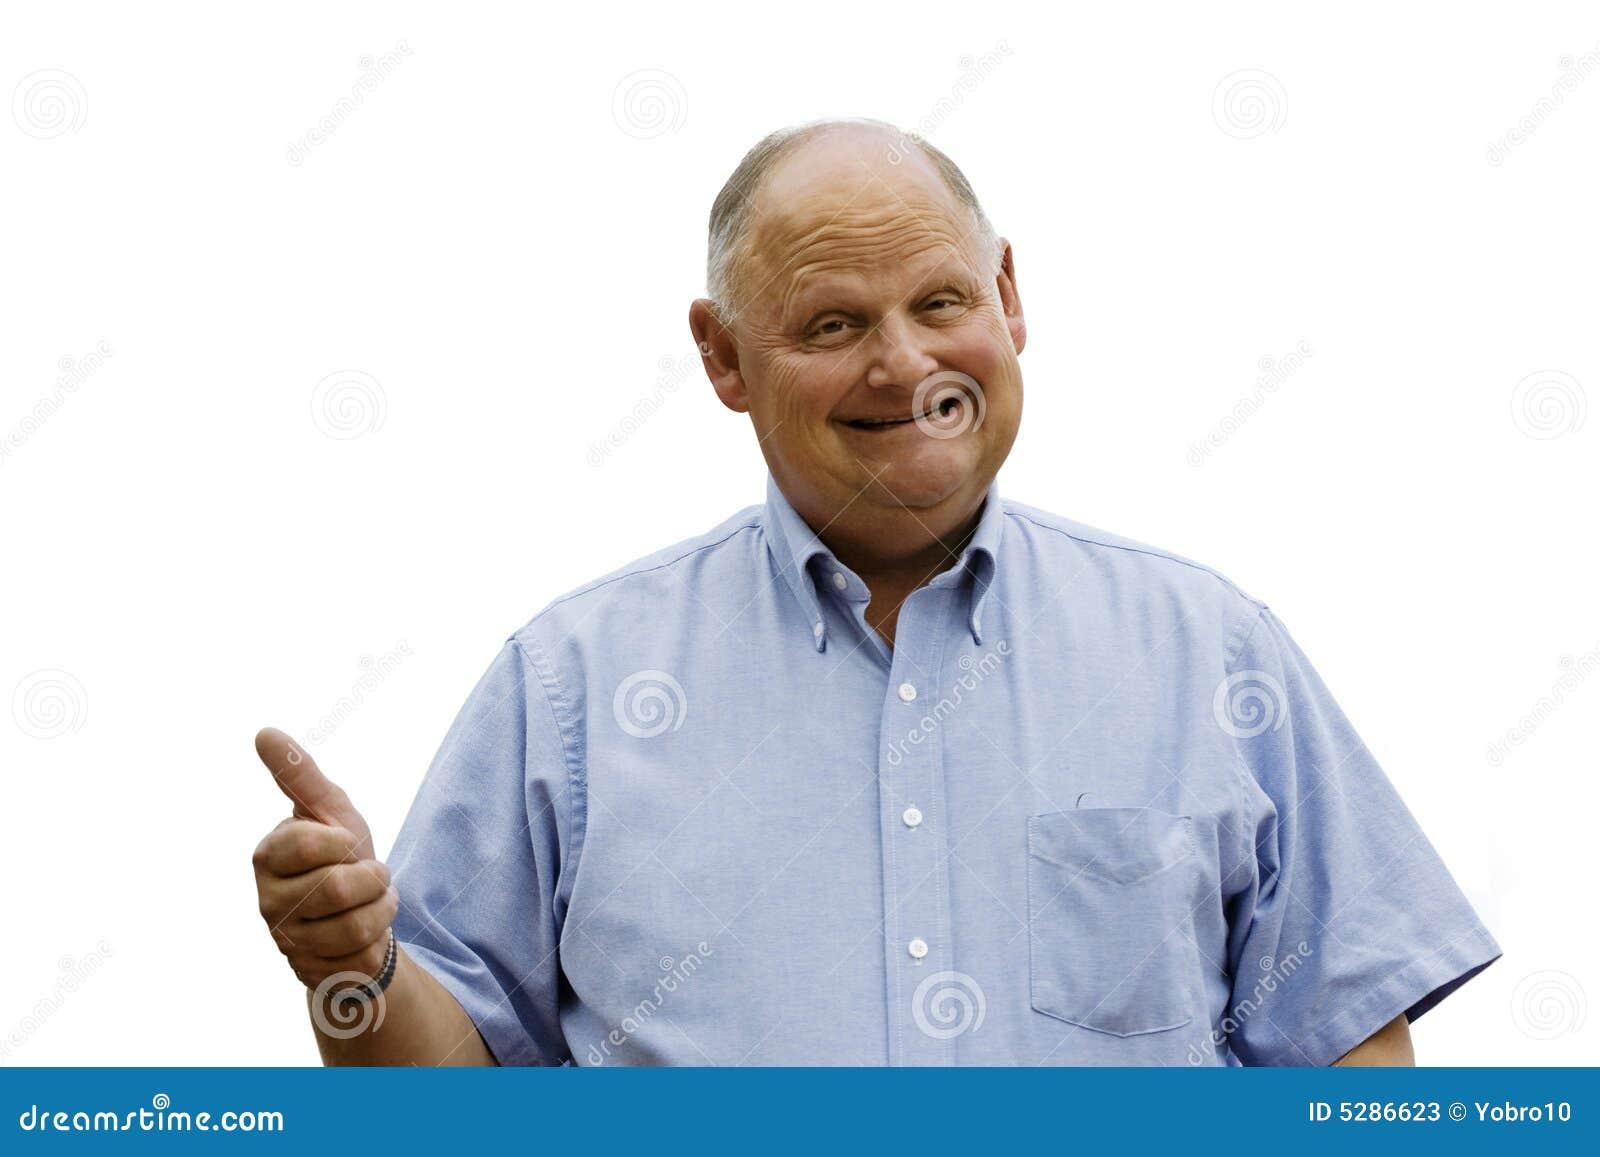 happy-old-man-5286623.jpg